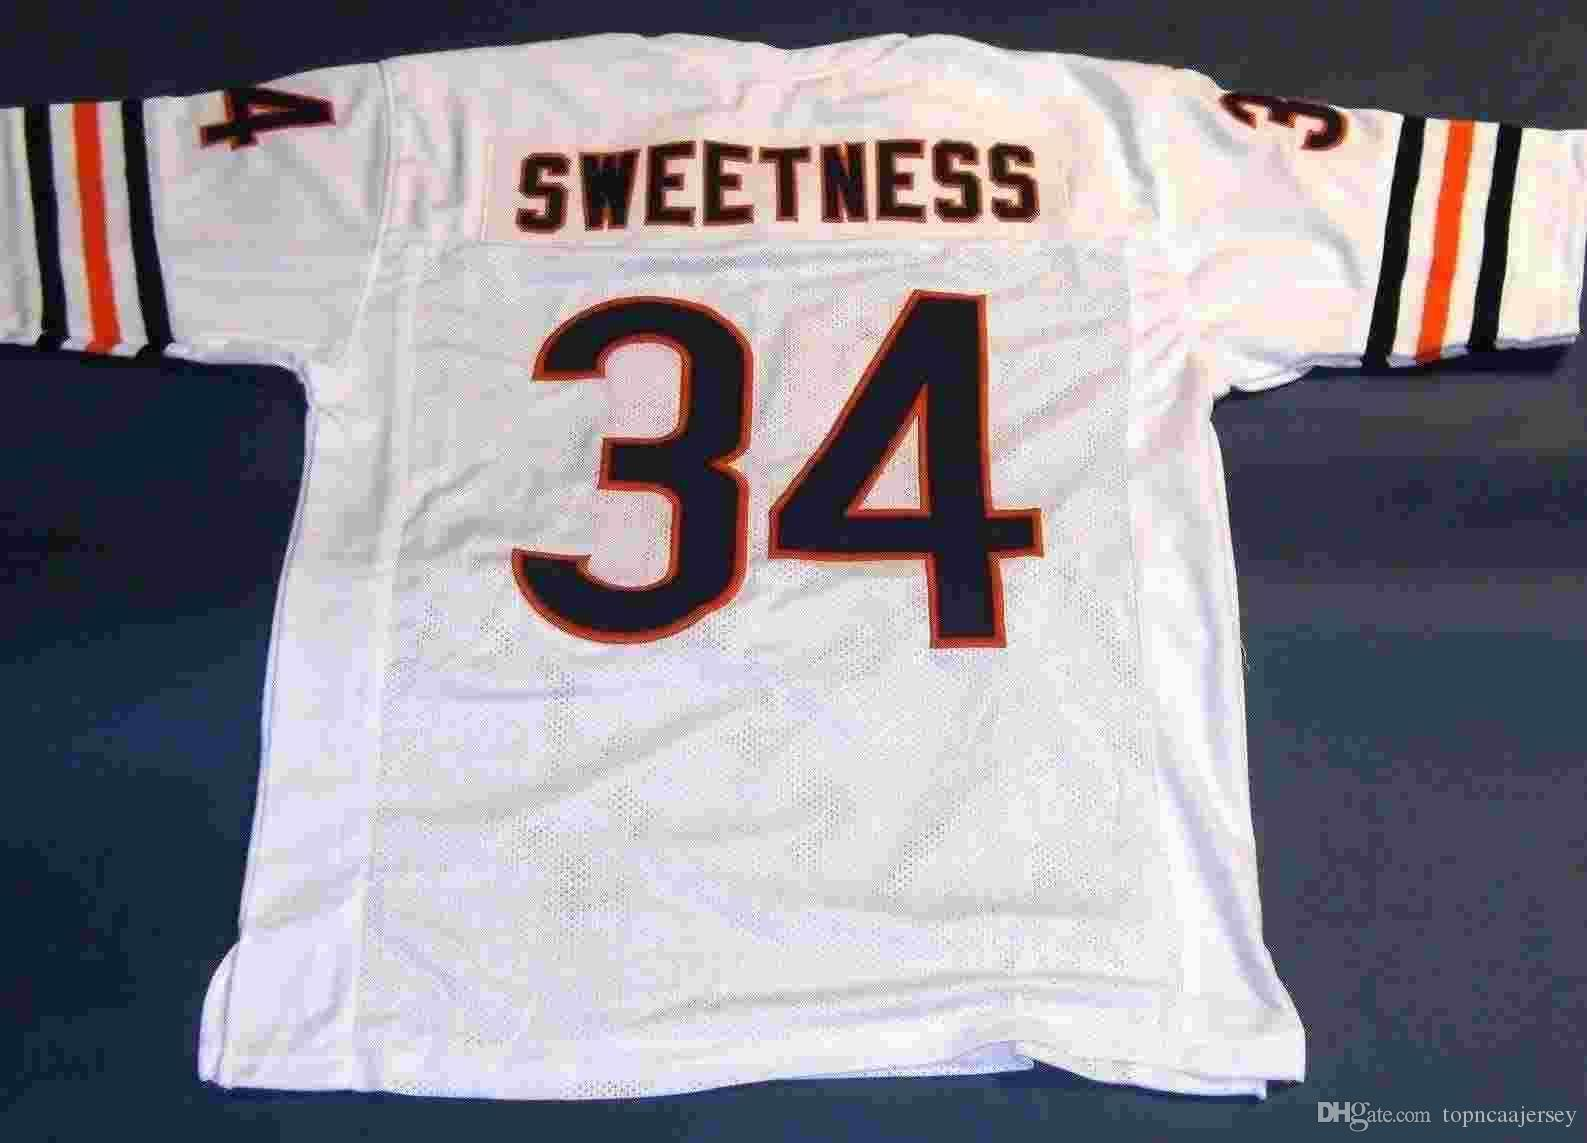 quality design 7b609 cea1f Cheap retro #34 WALTER PAYTON CUSTOM MITCHELL & NESS Jersey SWEETNESS white  Mens Stitching High-end Size S-5XL Football Jerseys College NCAA